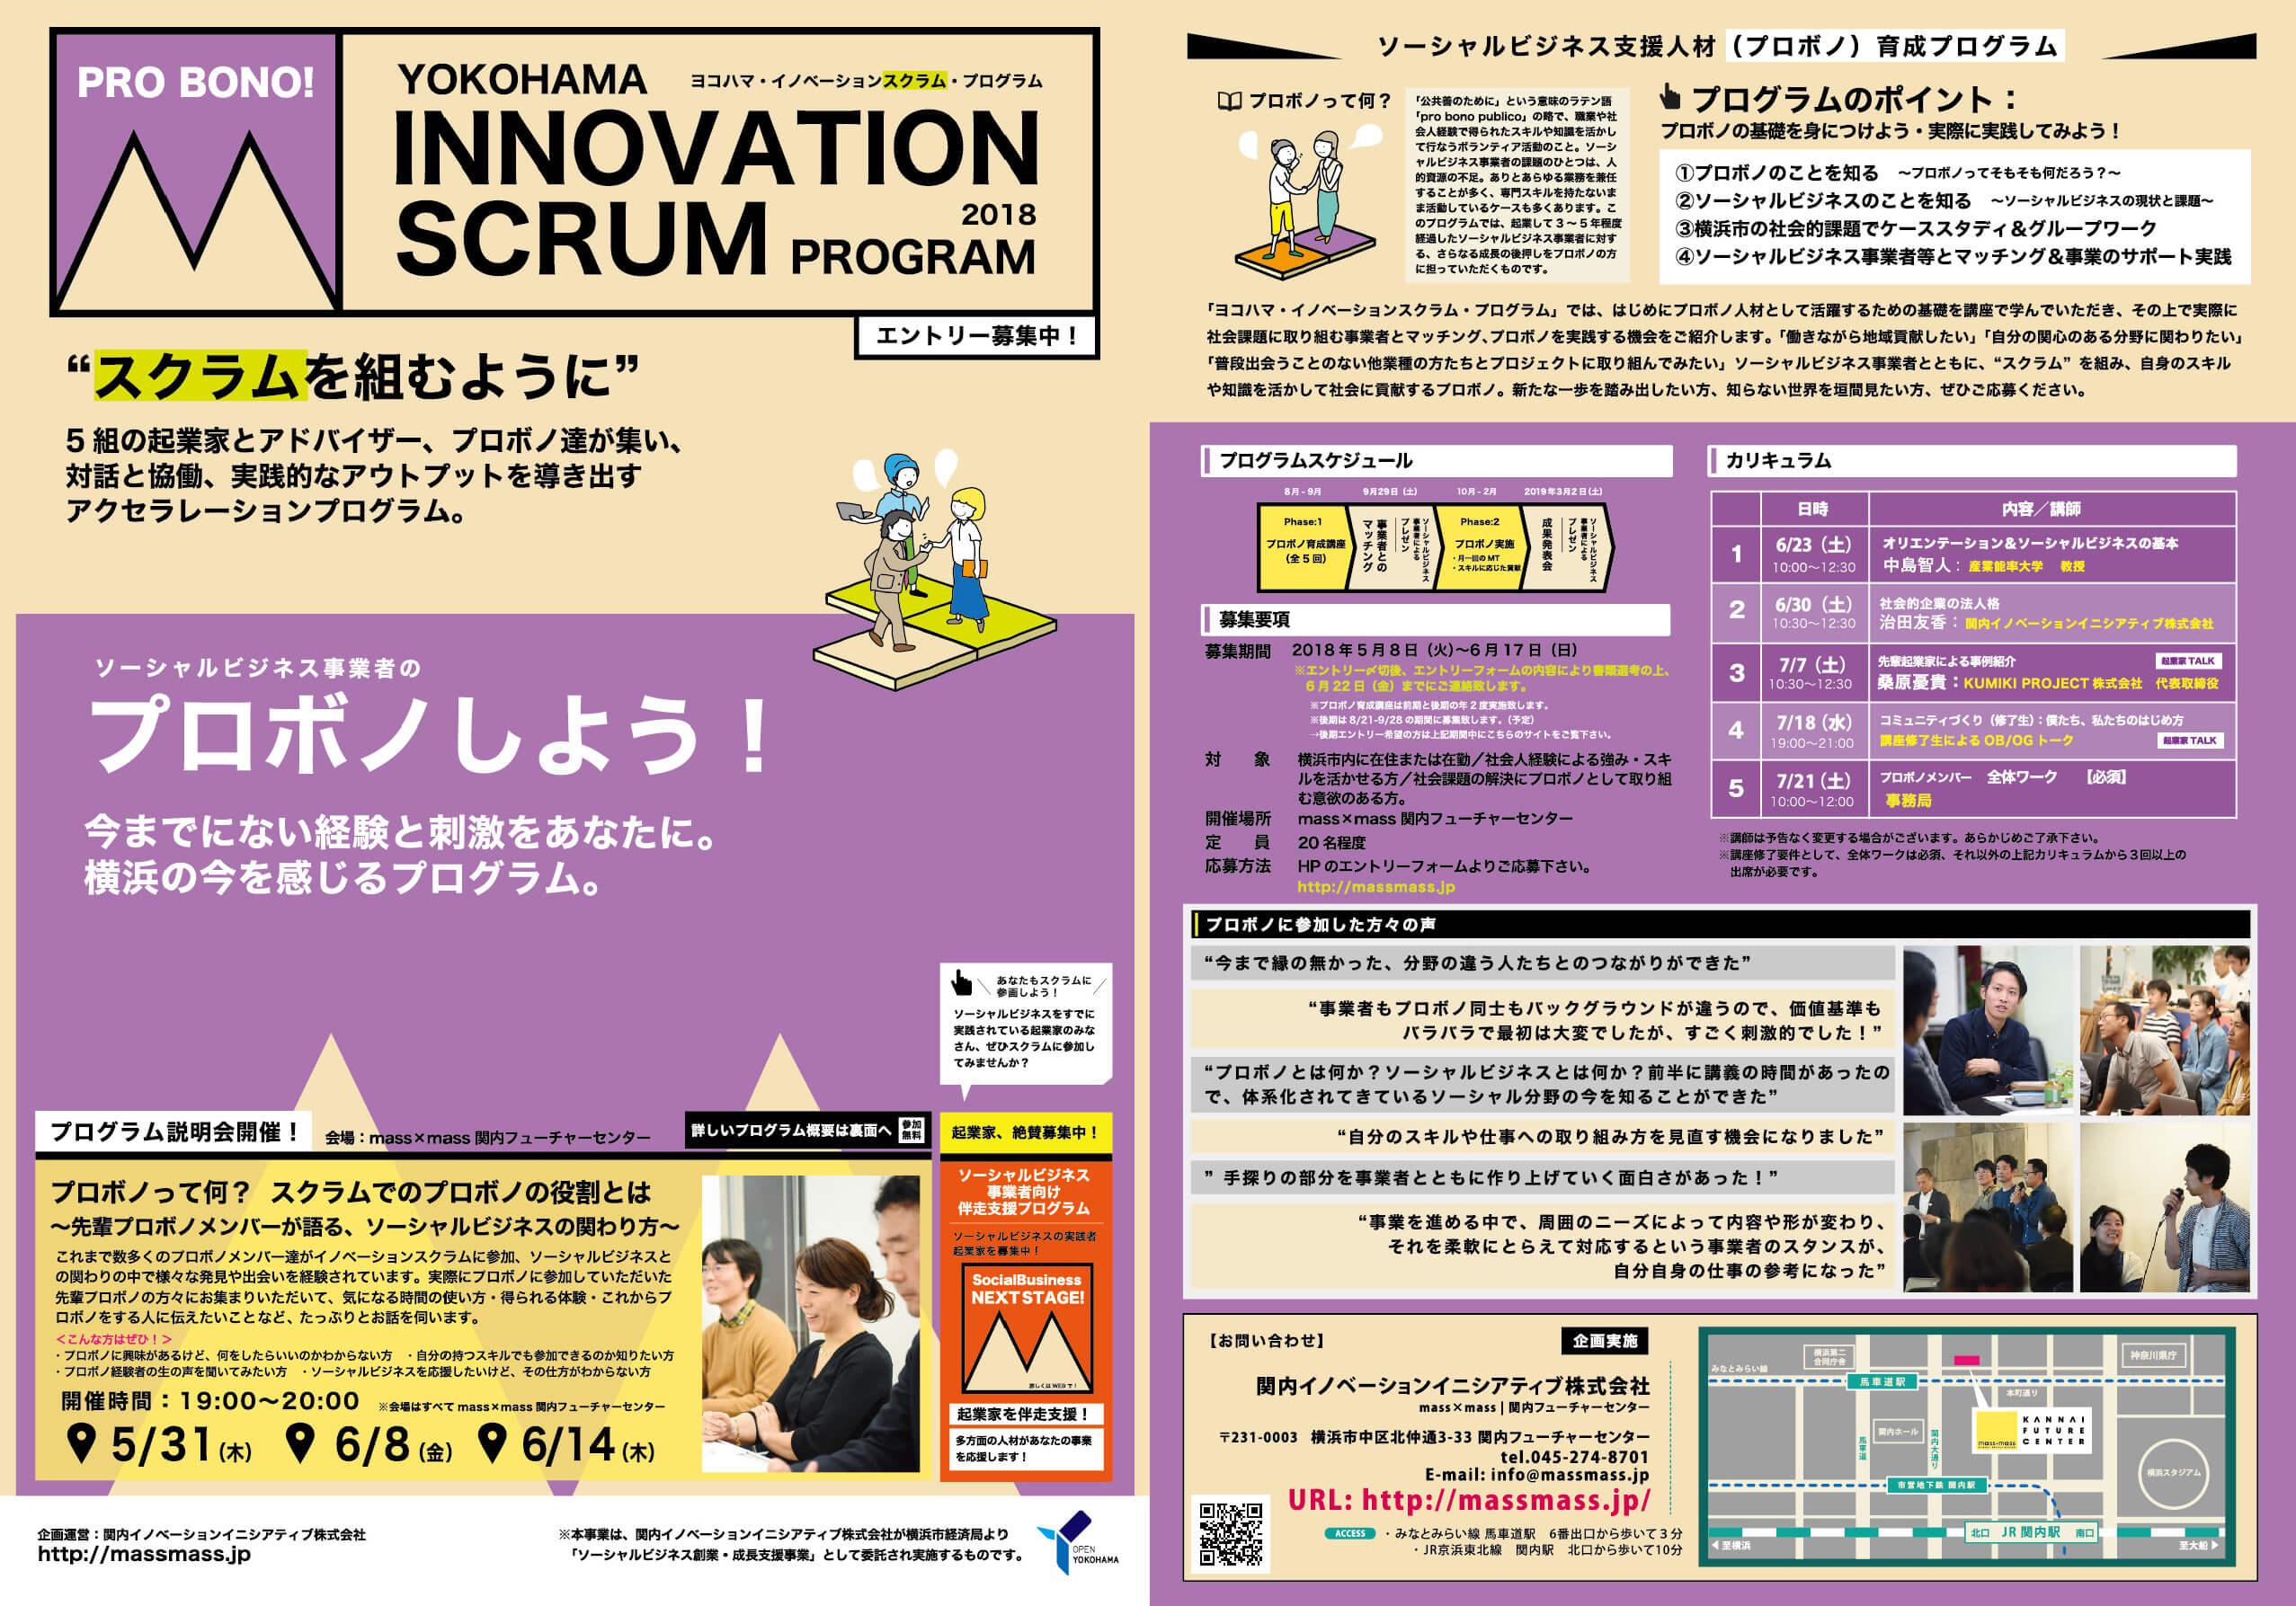 【2018】『INNOVATION SCRUM PROGRAM』前期プロボノ エントリー募集開始!